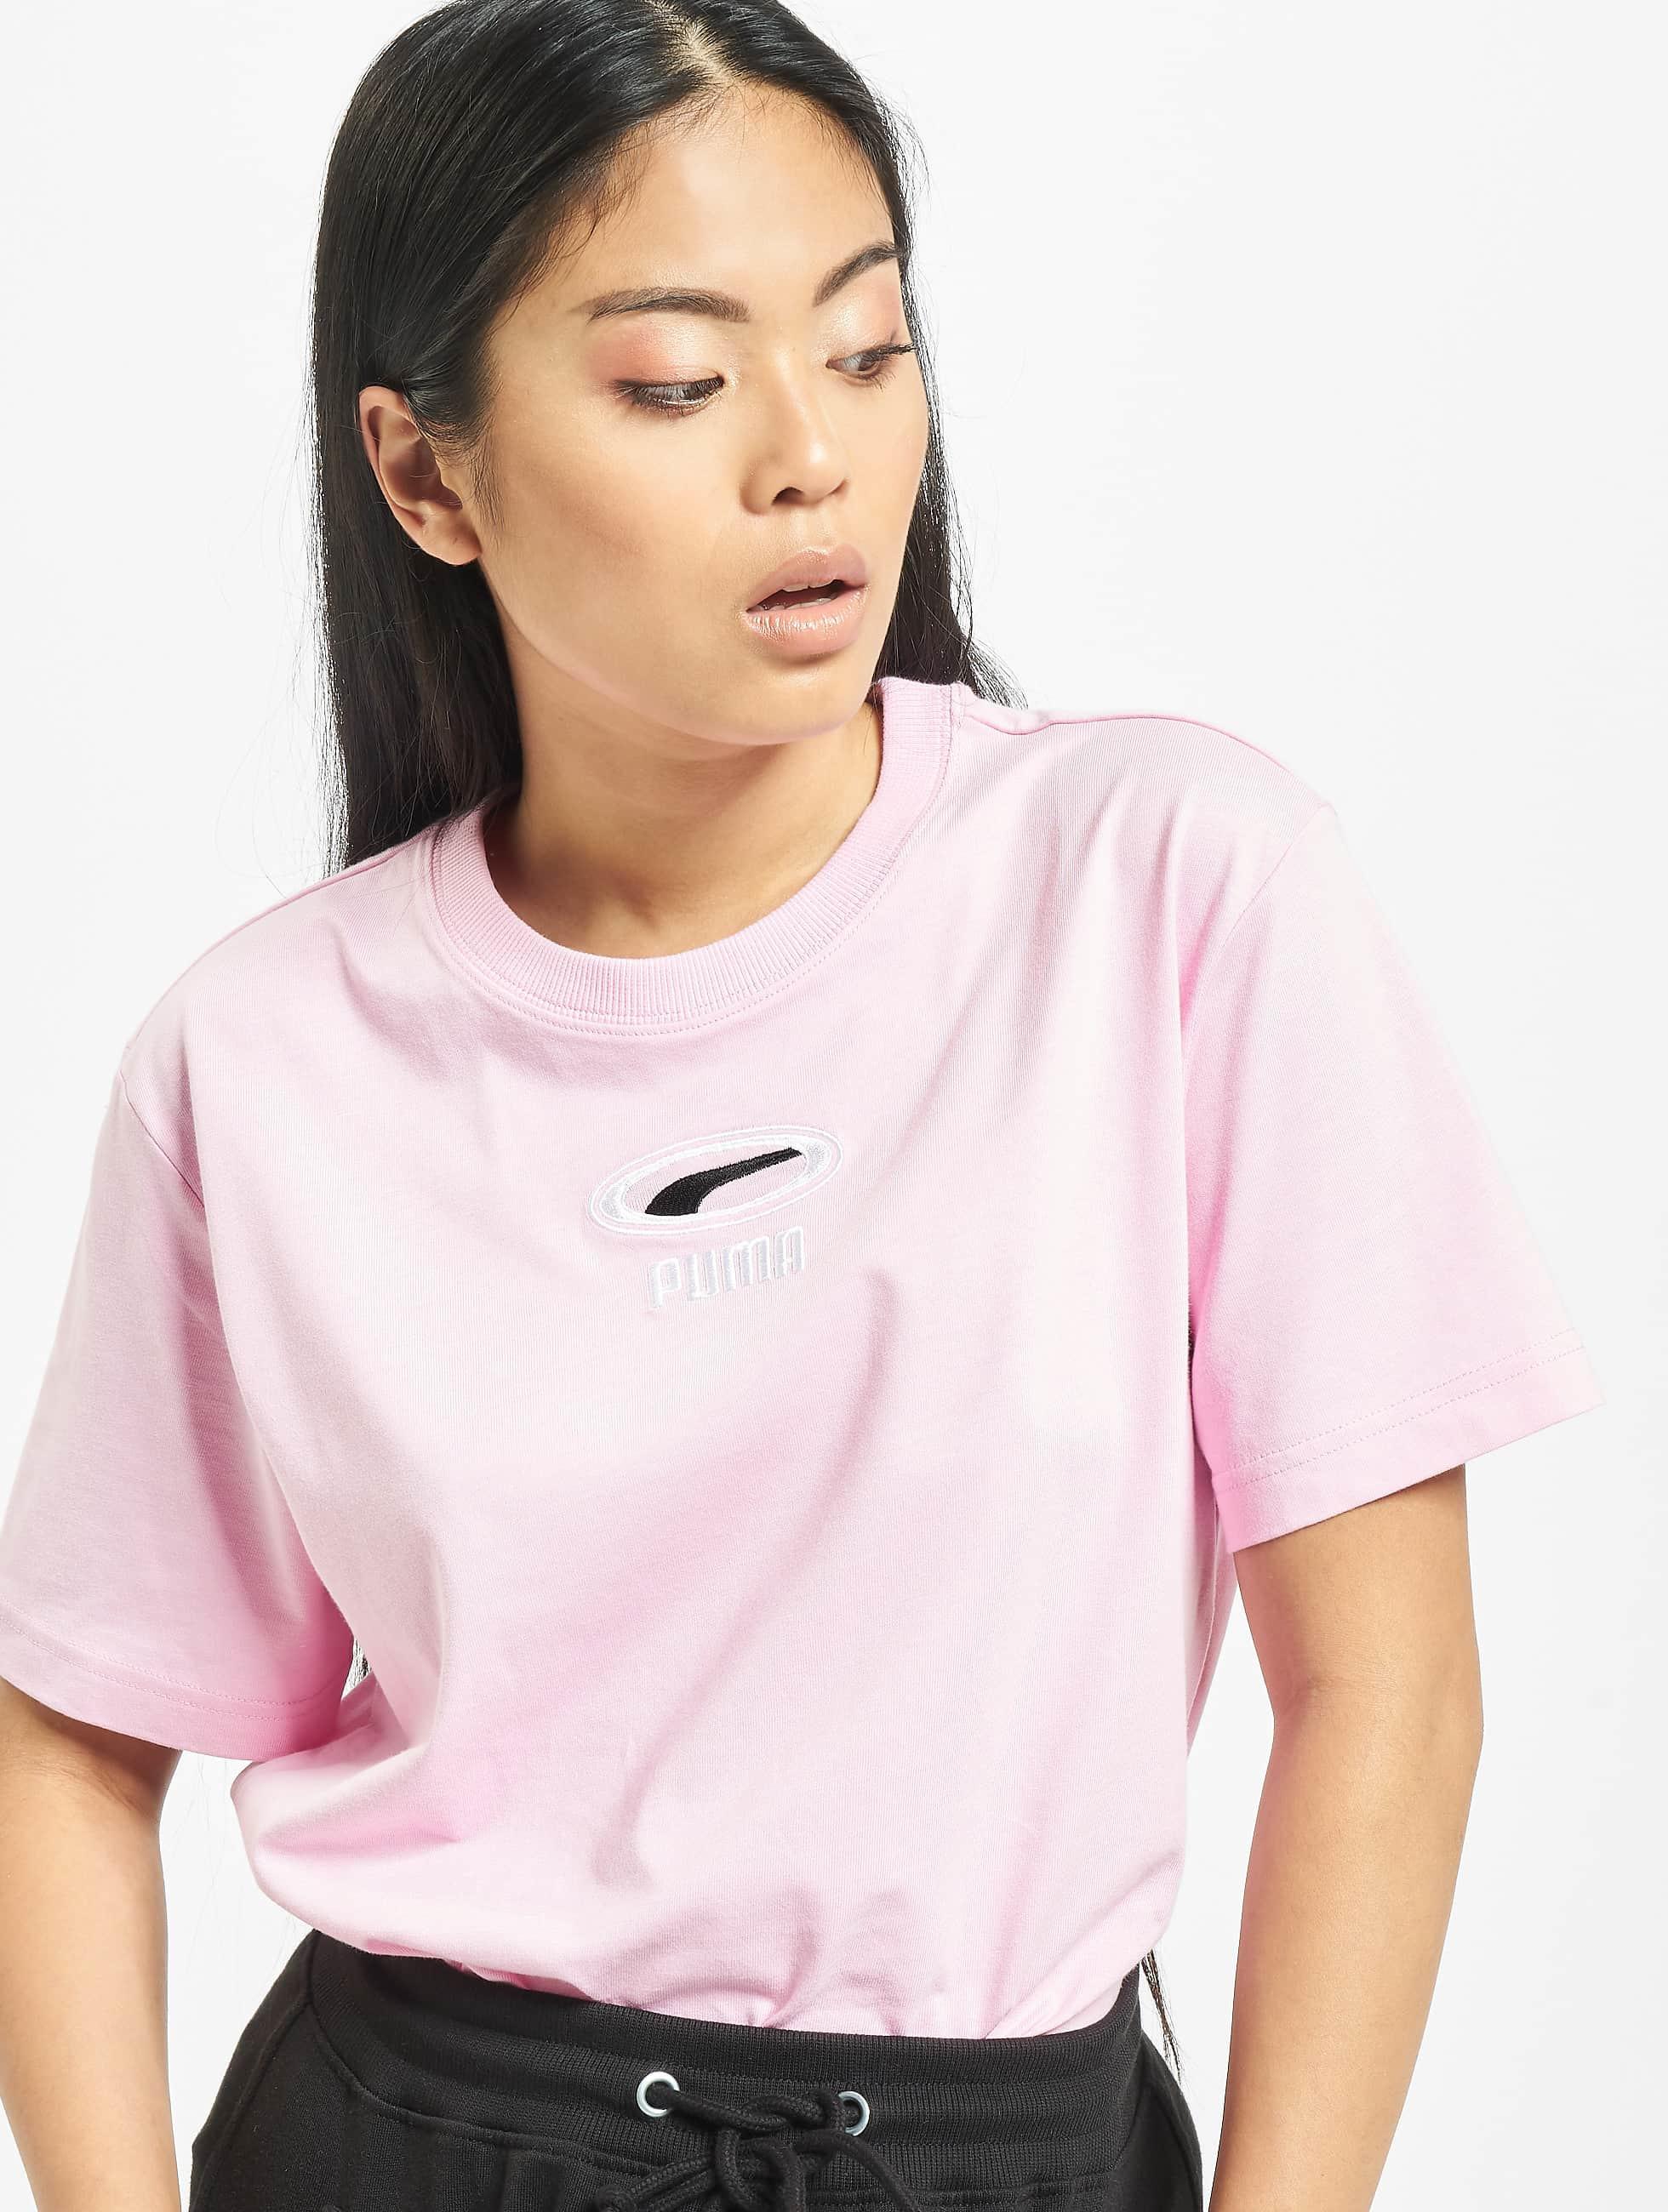 puma XTG Colorblock T shirt WOMENS Hibiscus bij